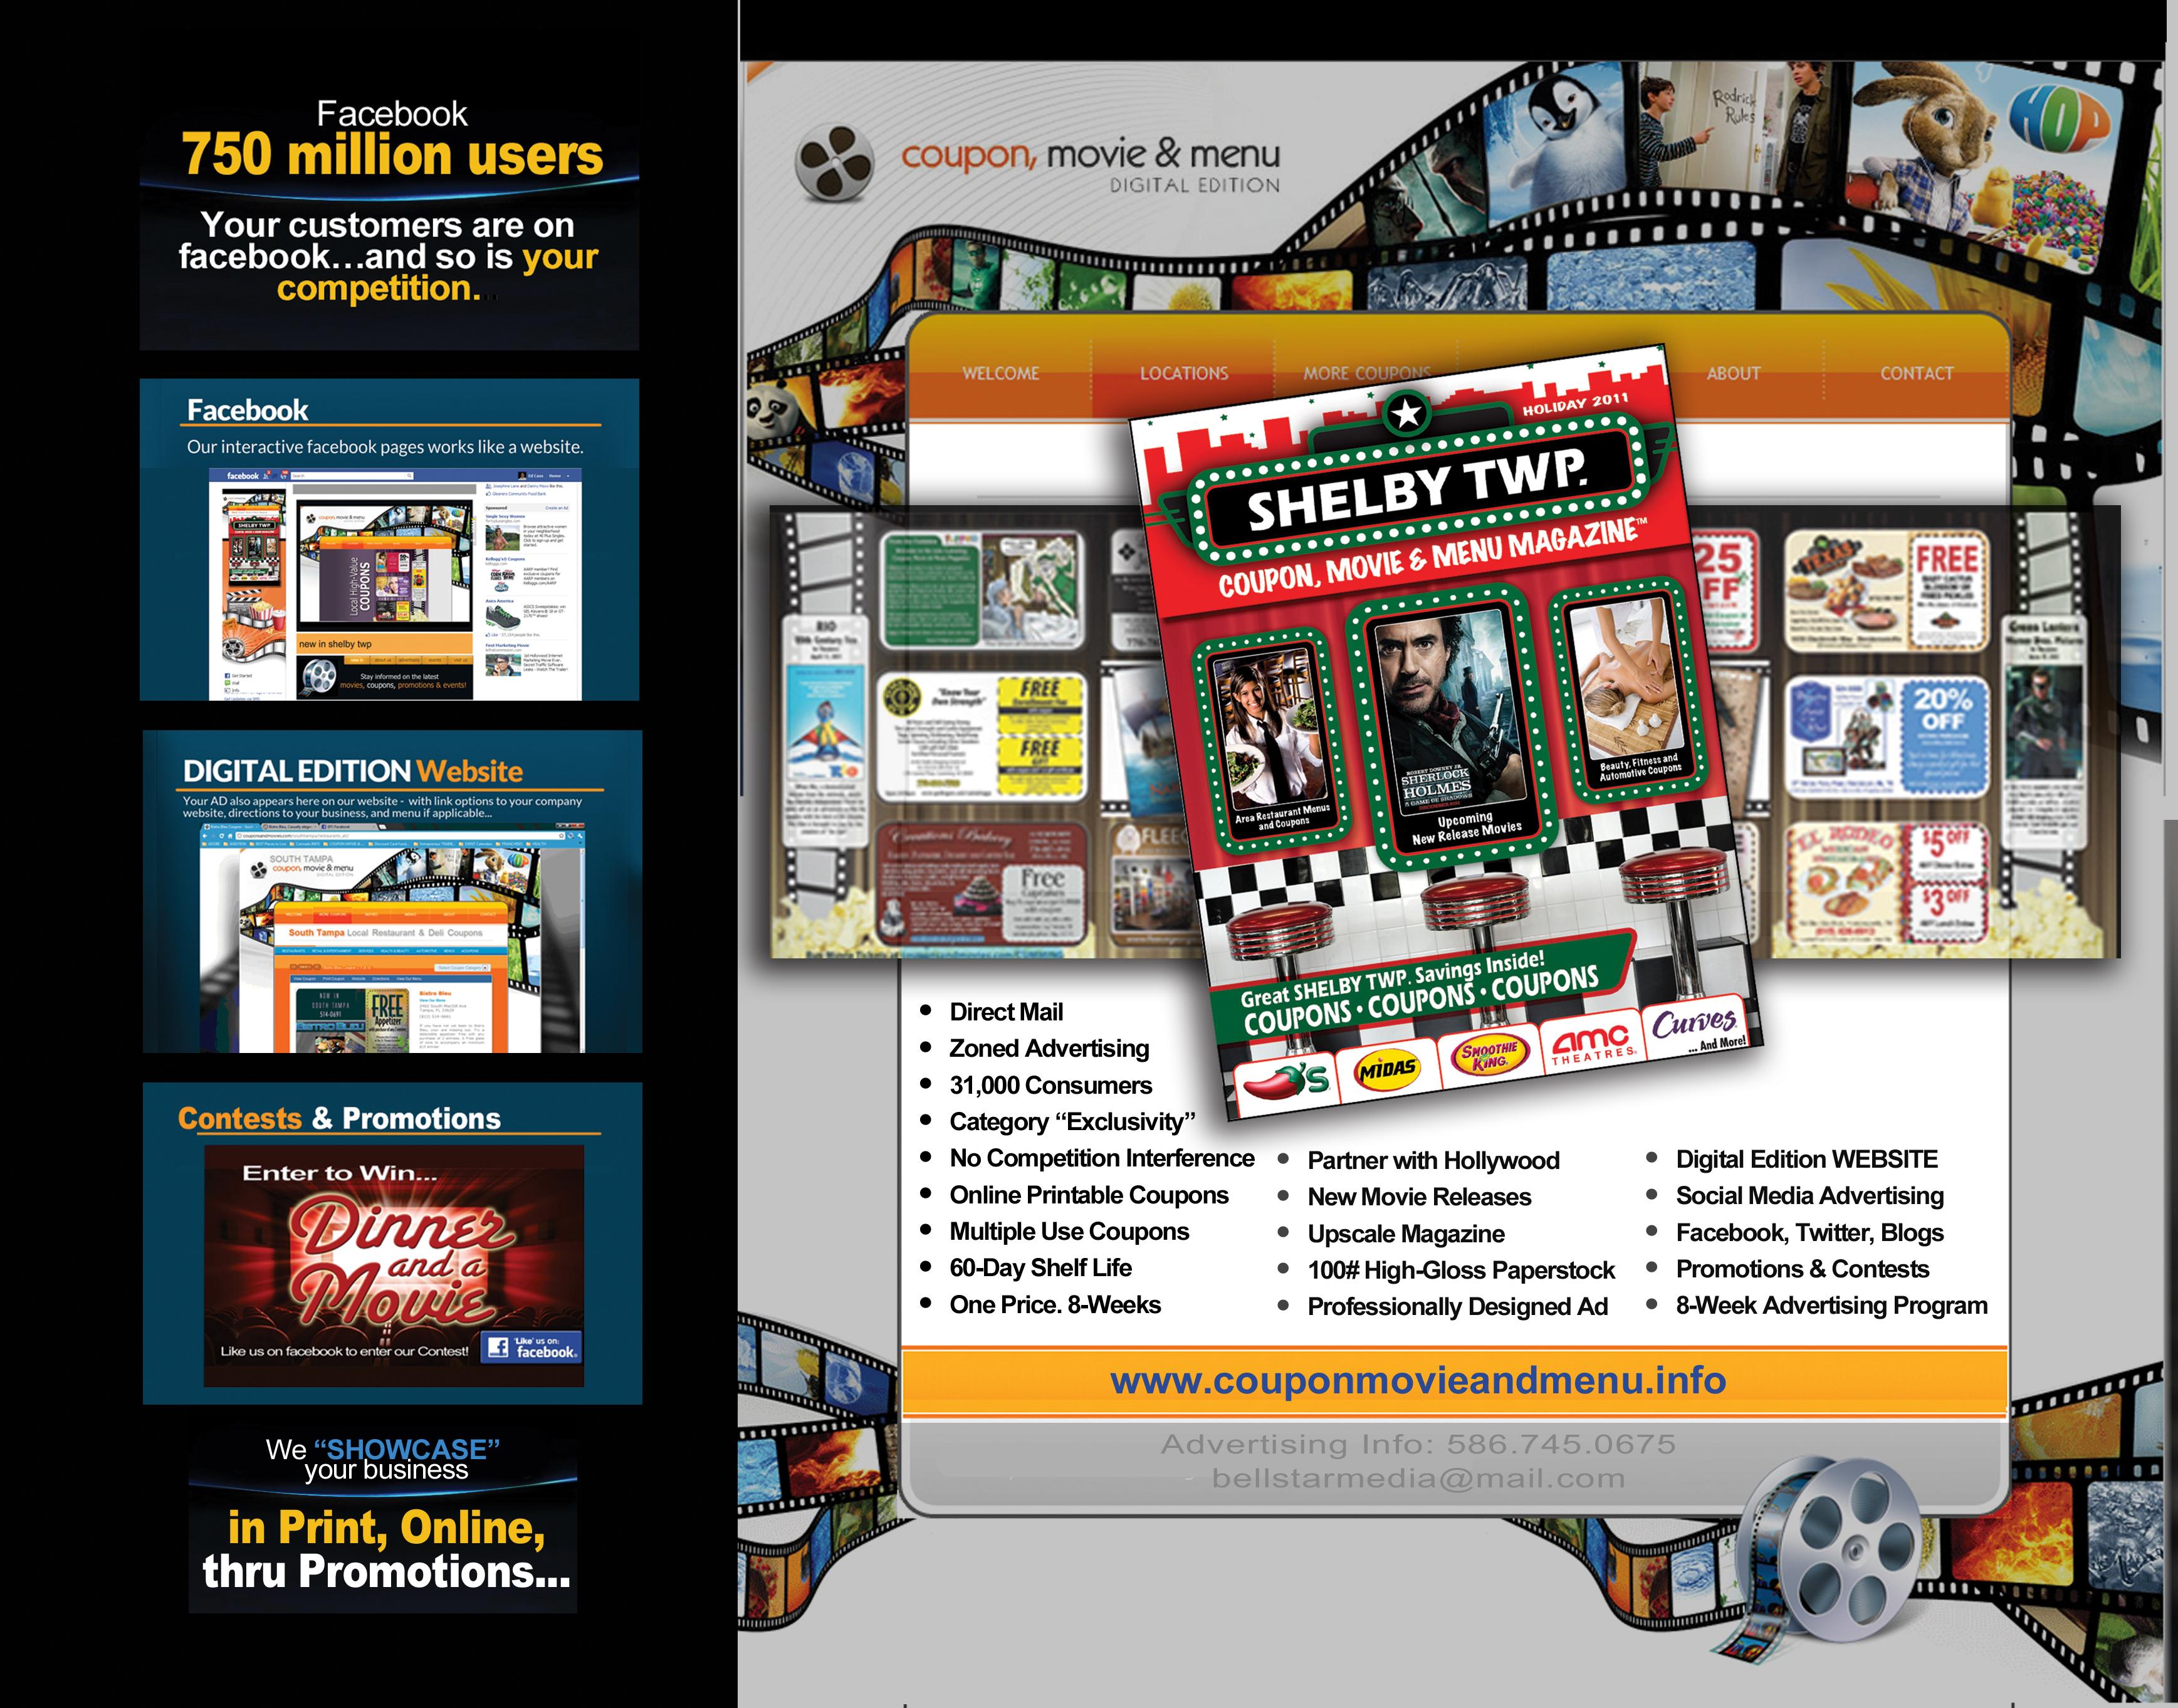 CMMM Tri-fold brochure inside